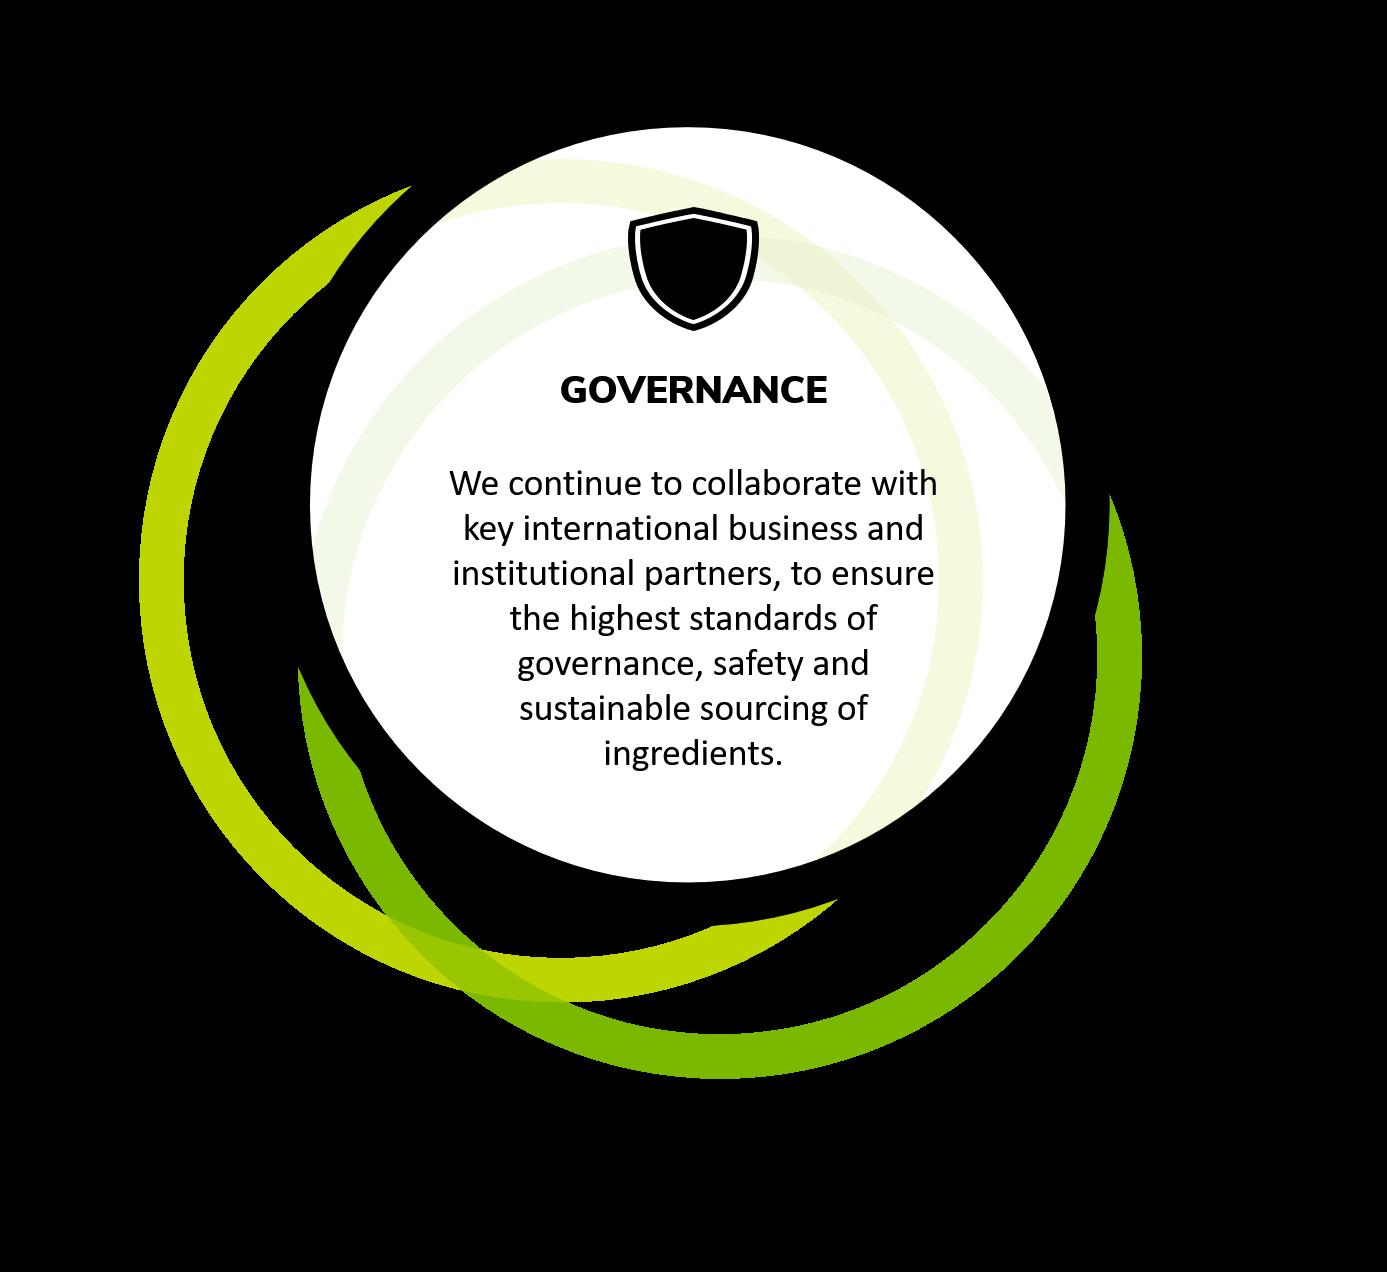 AGRI RESOURCES GUINEA GOVERNANCE.jpg